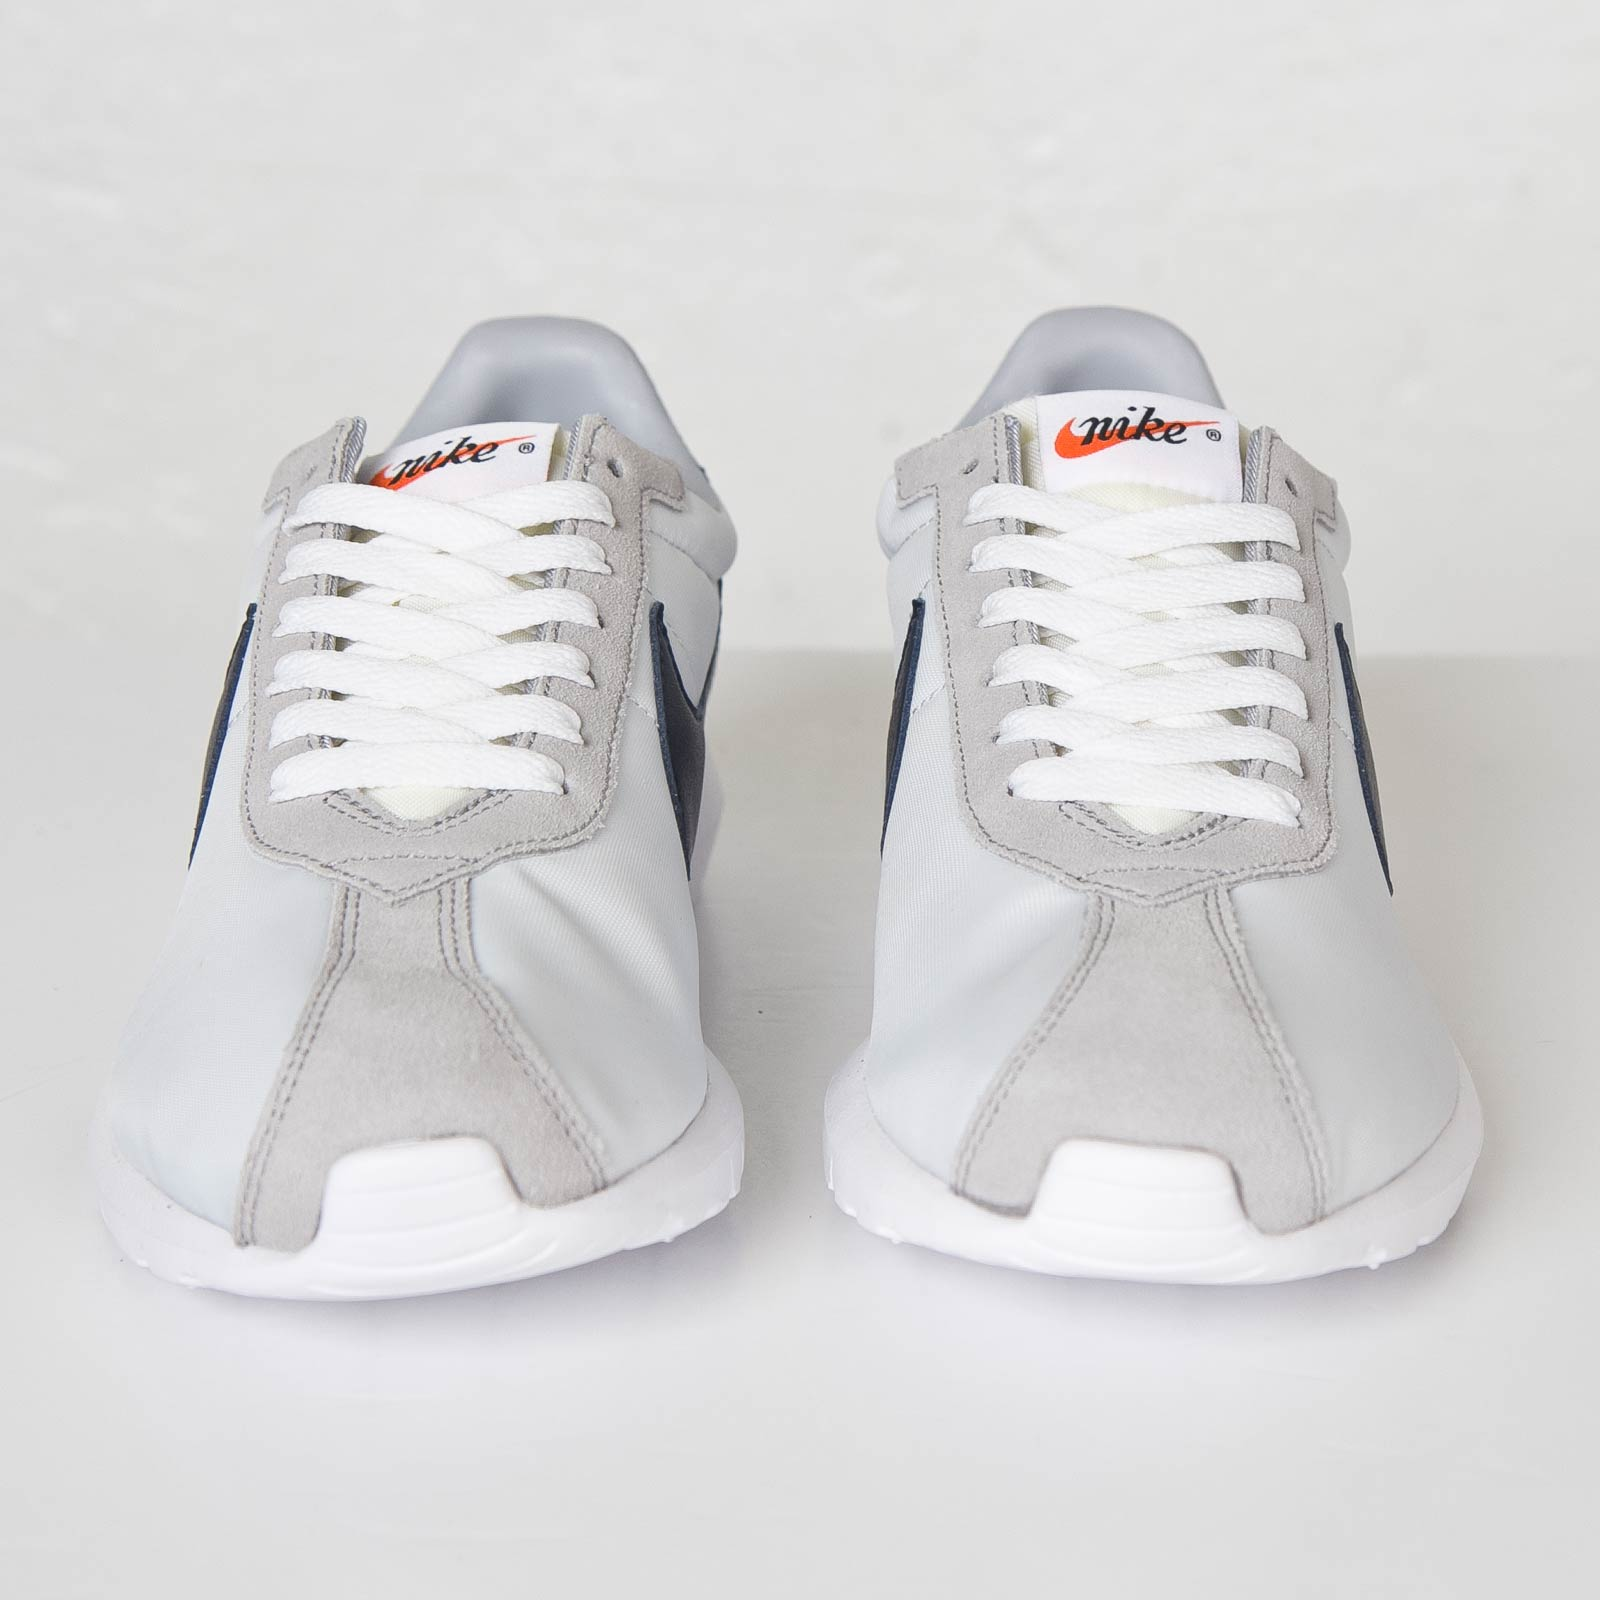 Nike Roshe LD 1000 QS Pure Platinum